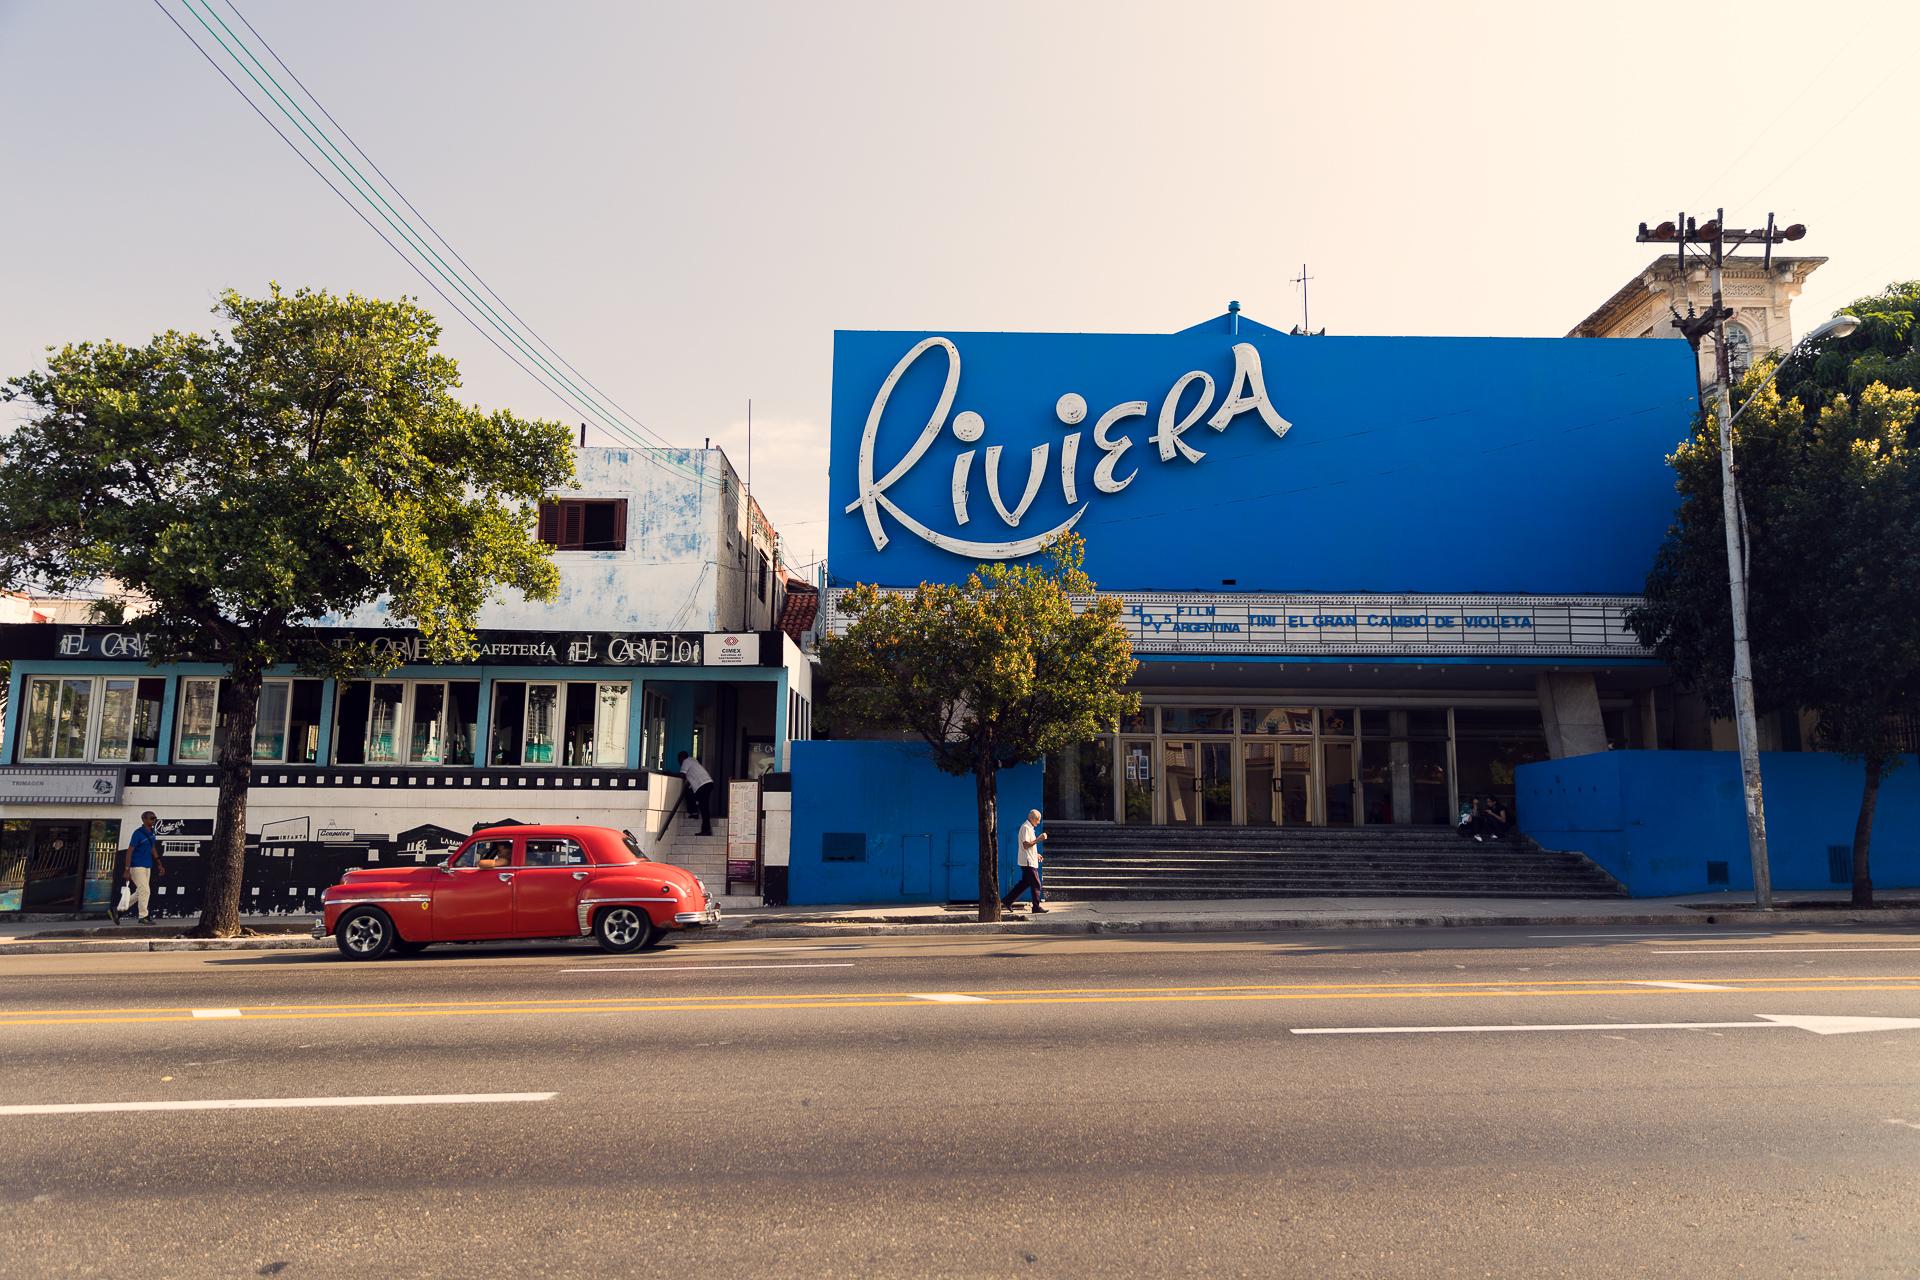 Bild: Oldtimer in den Straßen Havannas